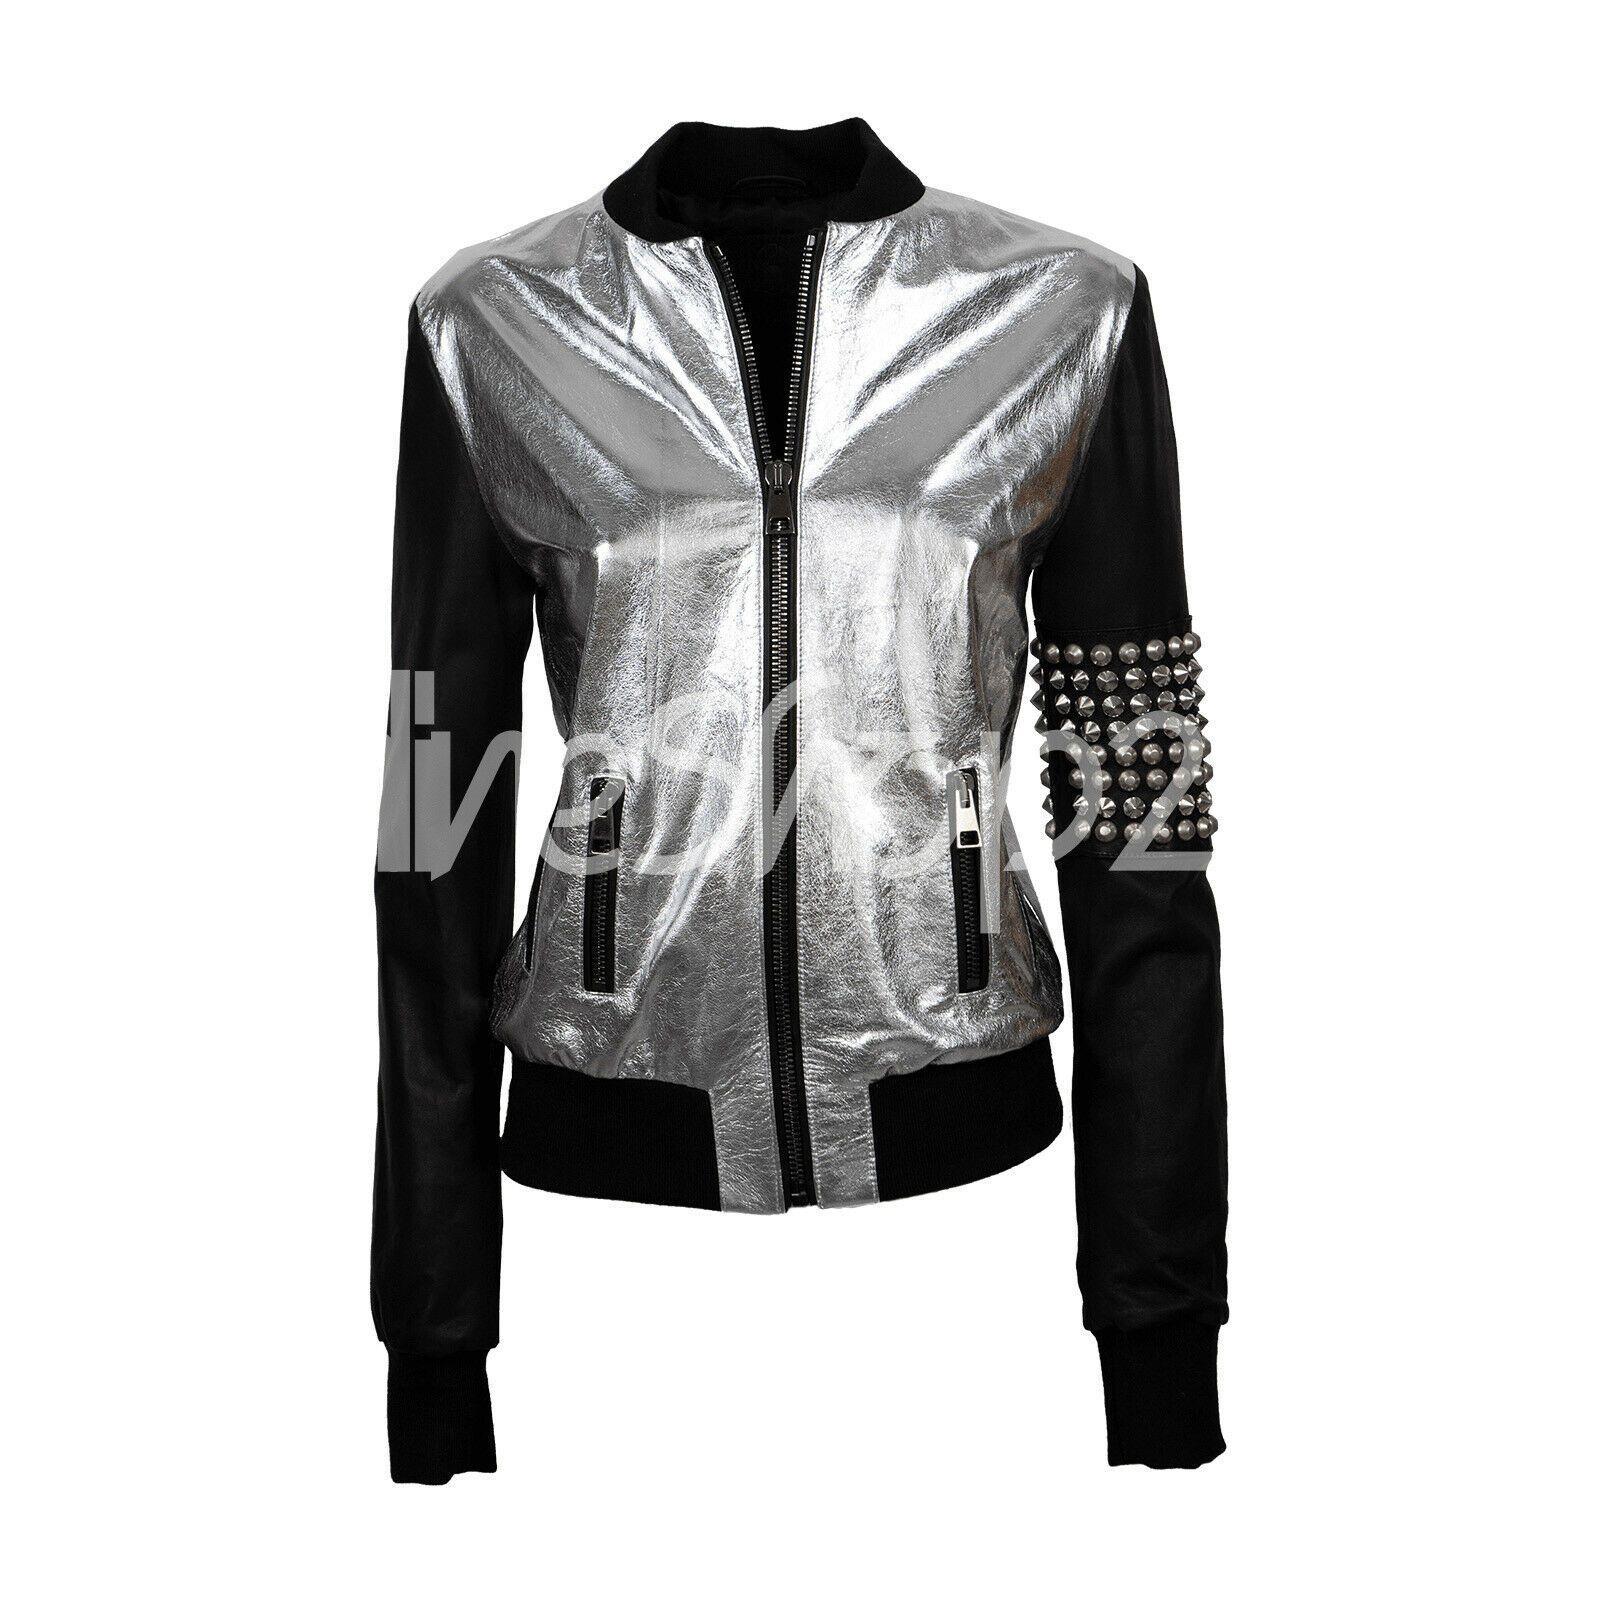 New Women Unique Black Silver Shiny Silver Studded Skull Biker Leather Jacket Leather Jacket Blue Jacket Men Jackets For Women [ 1600 x 1600 Pixel ]